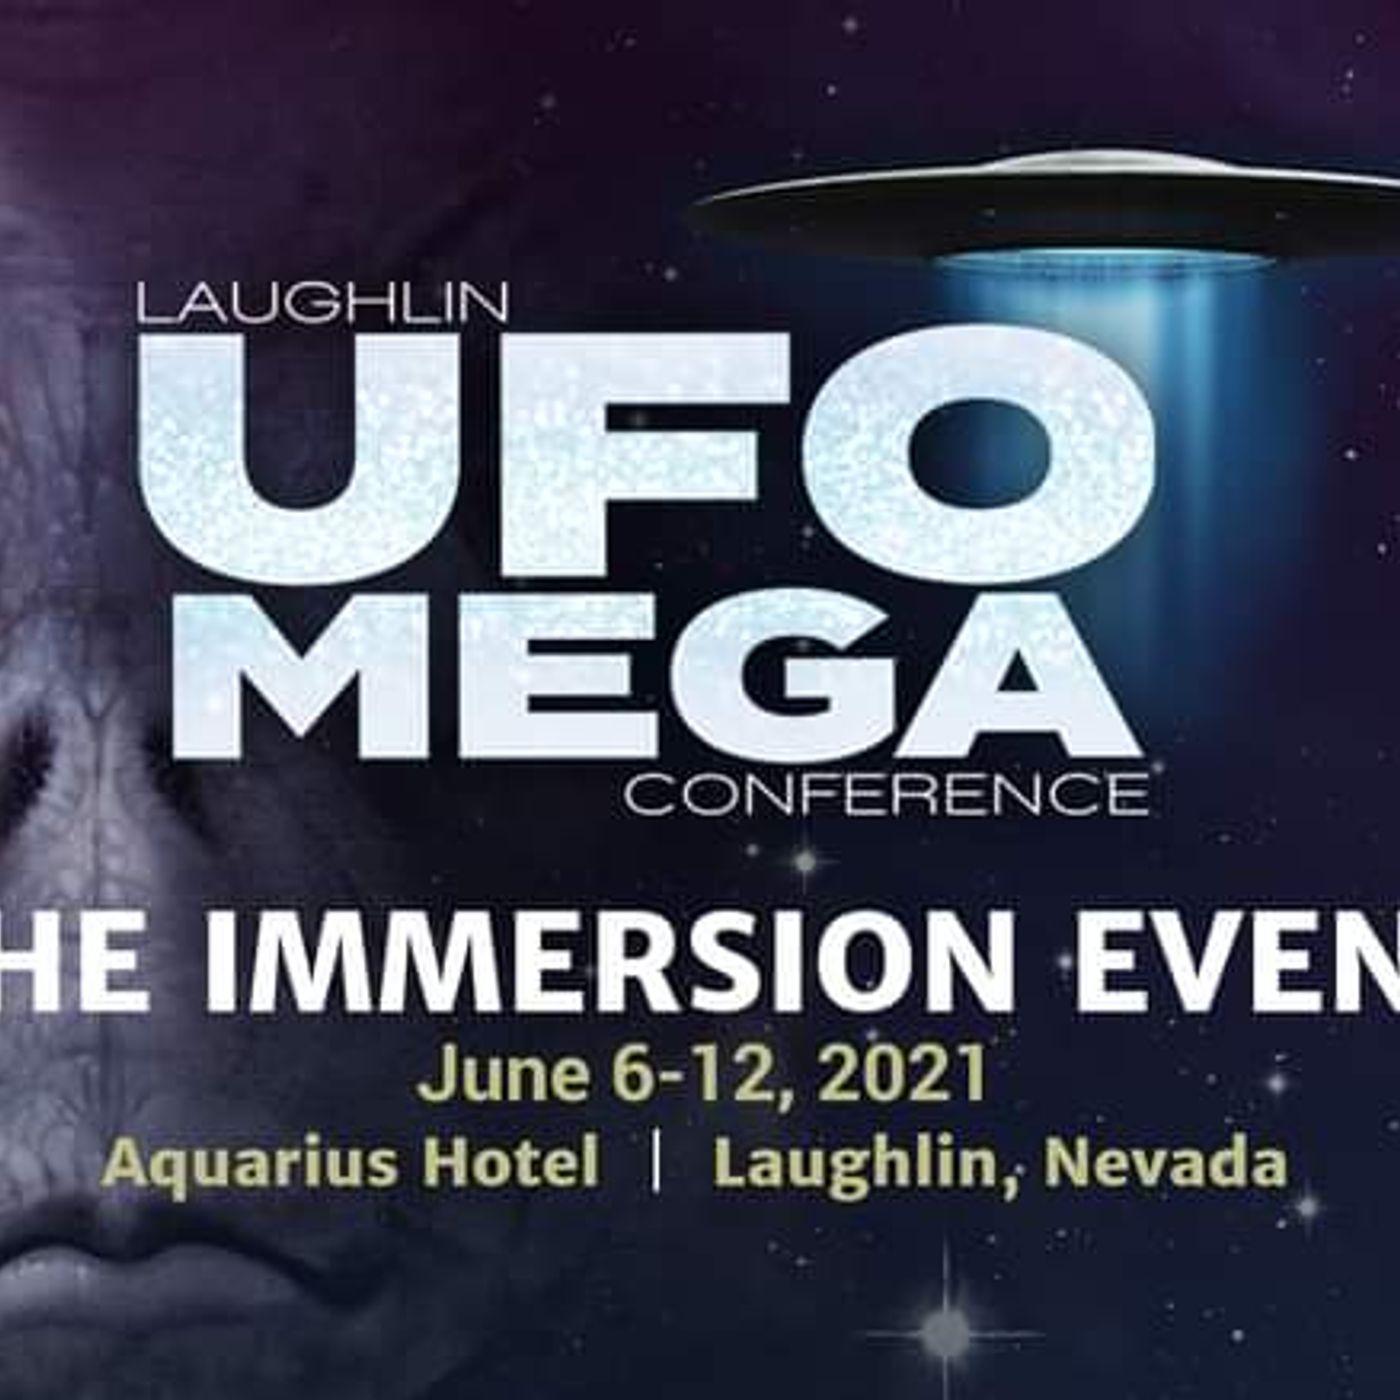 Laughlin UFO Megaconference: Sarah Adams and Michael Telstarr